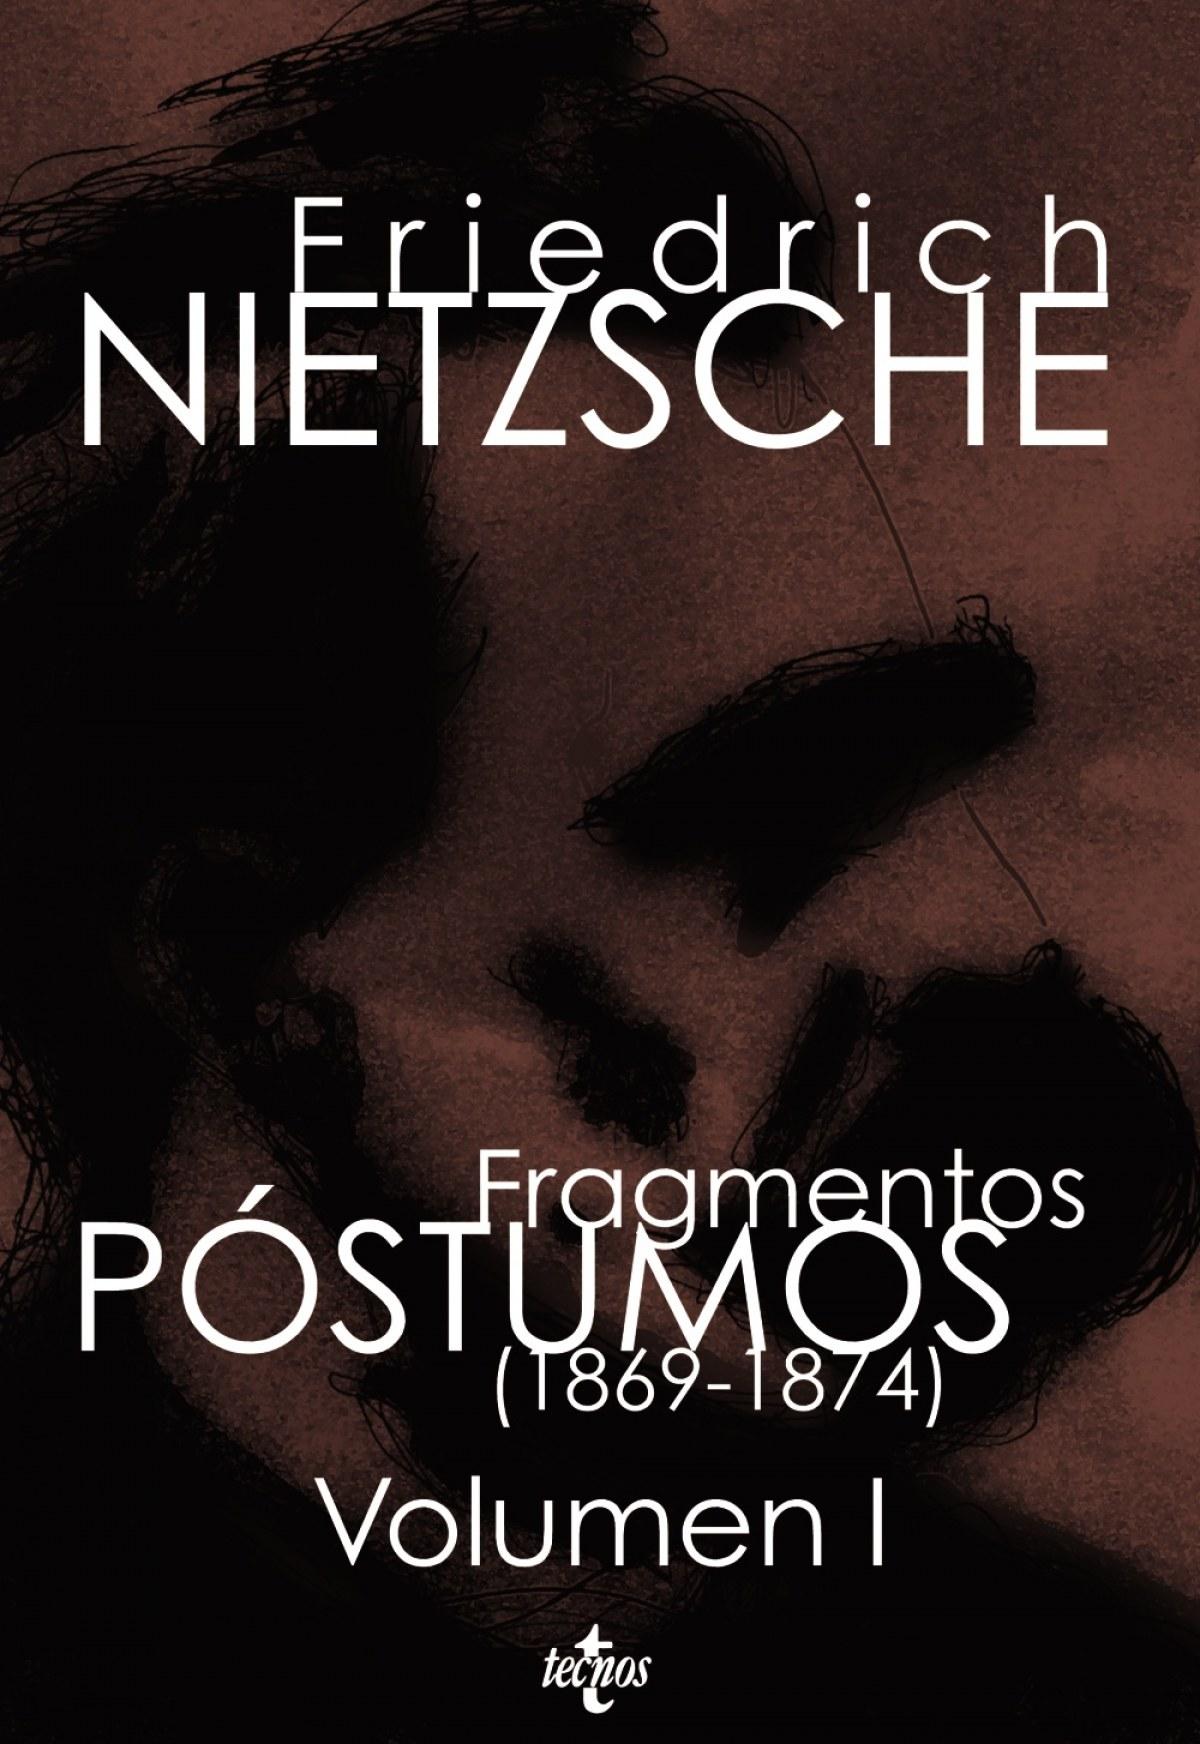 Fragmentos póstumos (1869-1874)